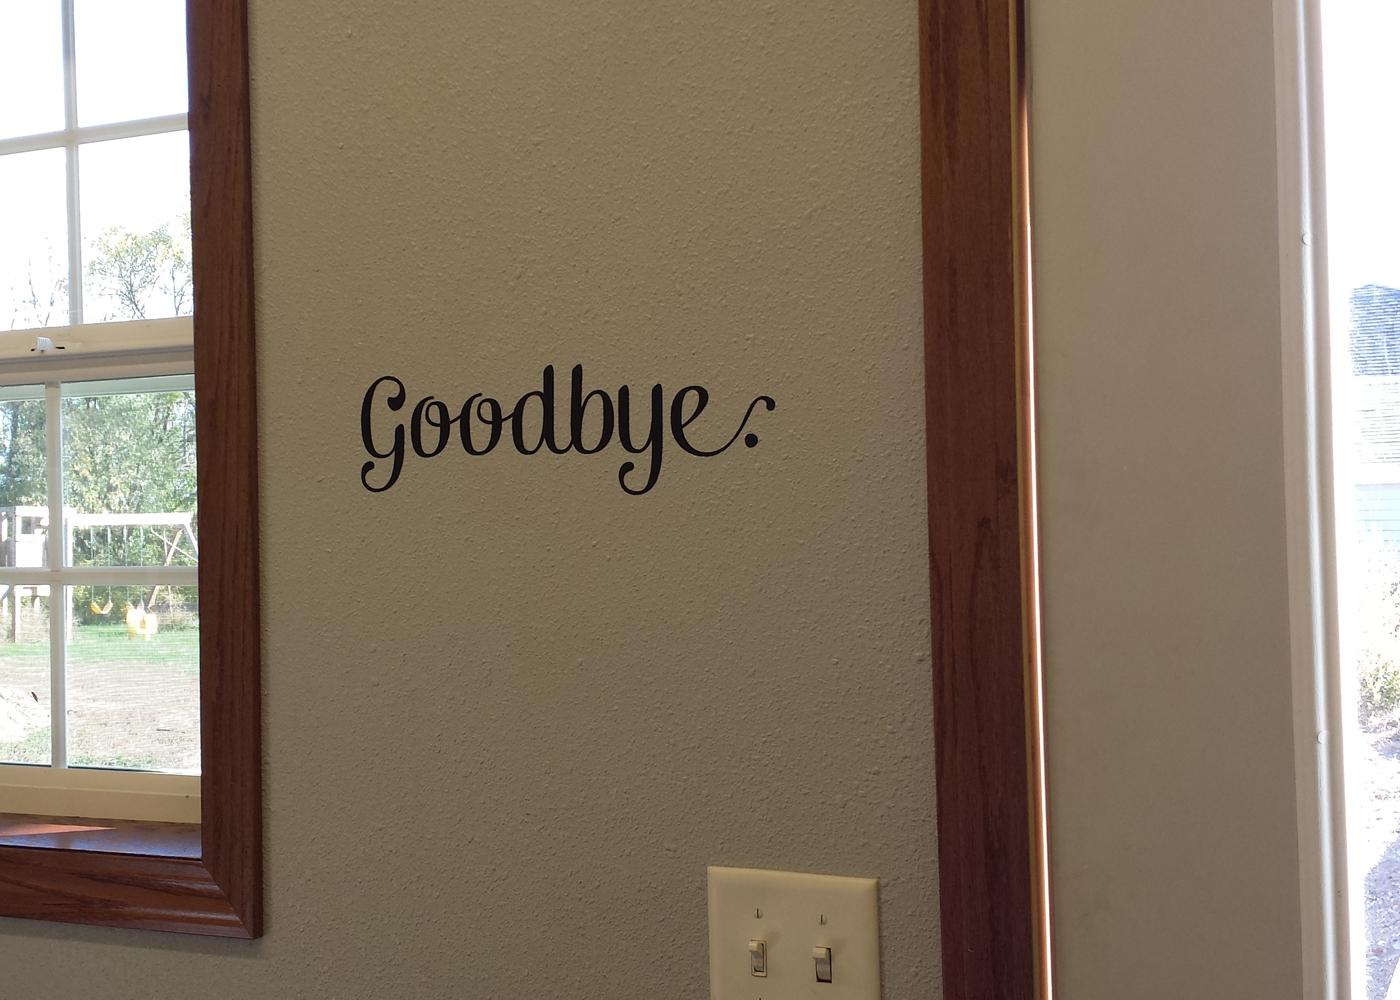 da023-h-i-hello-goodbye-wall-decal-saying.jpg